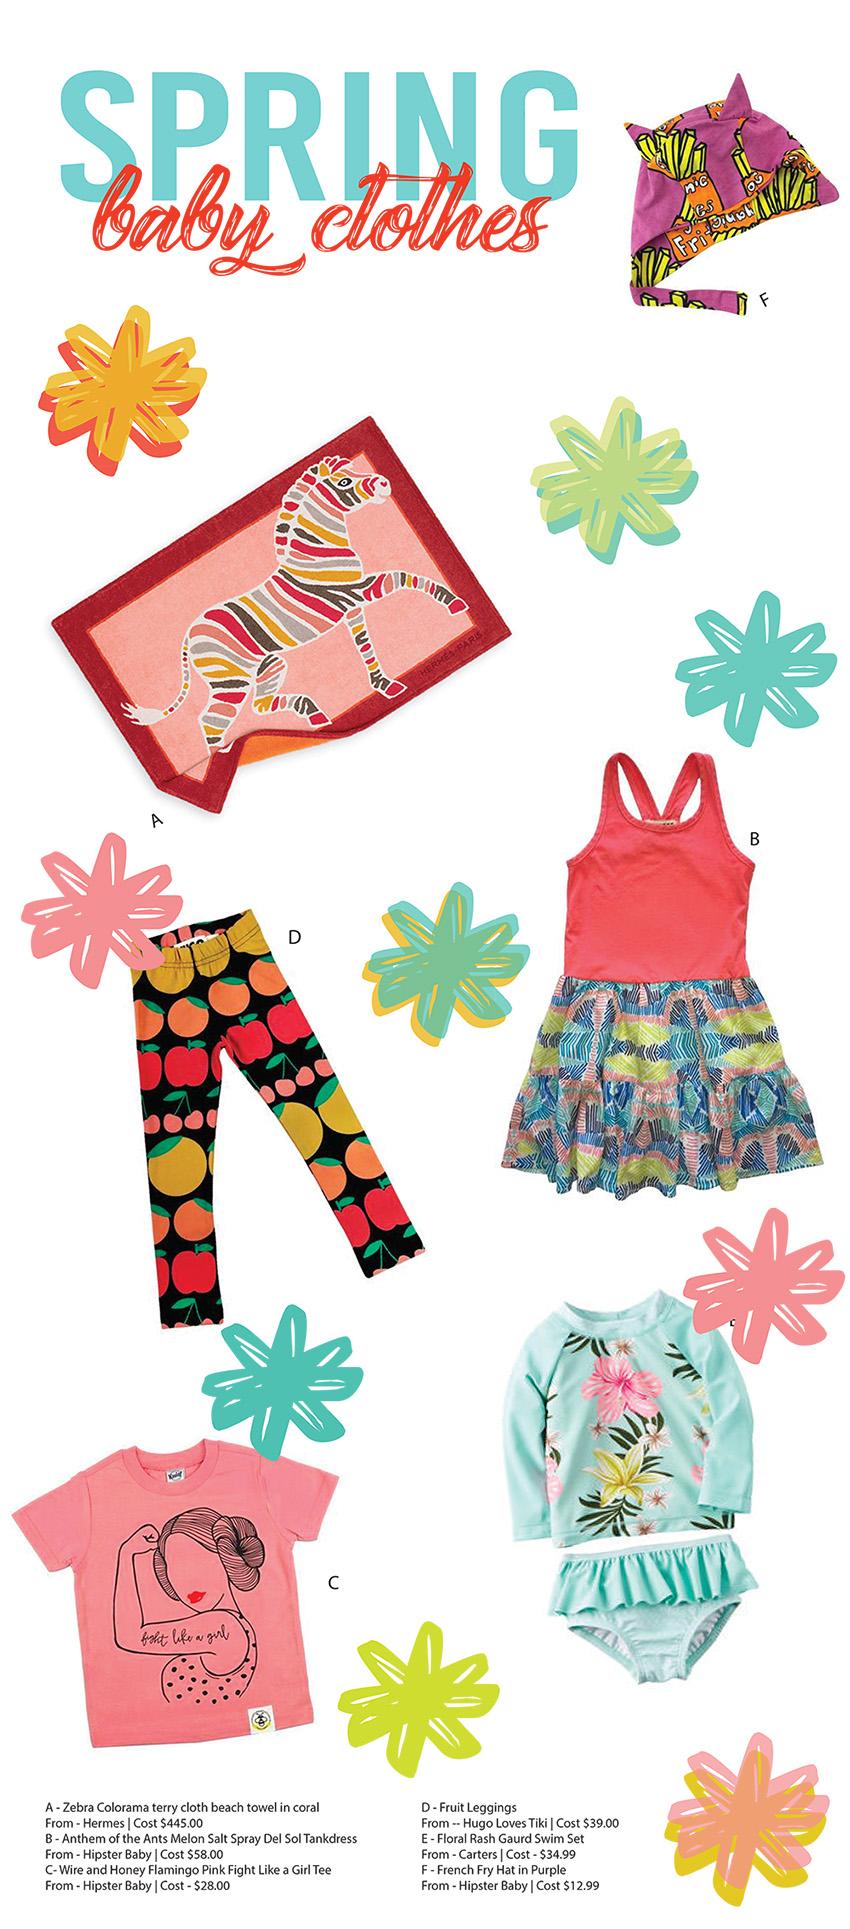 BabyClothes.jpg